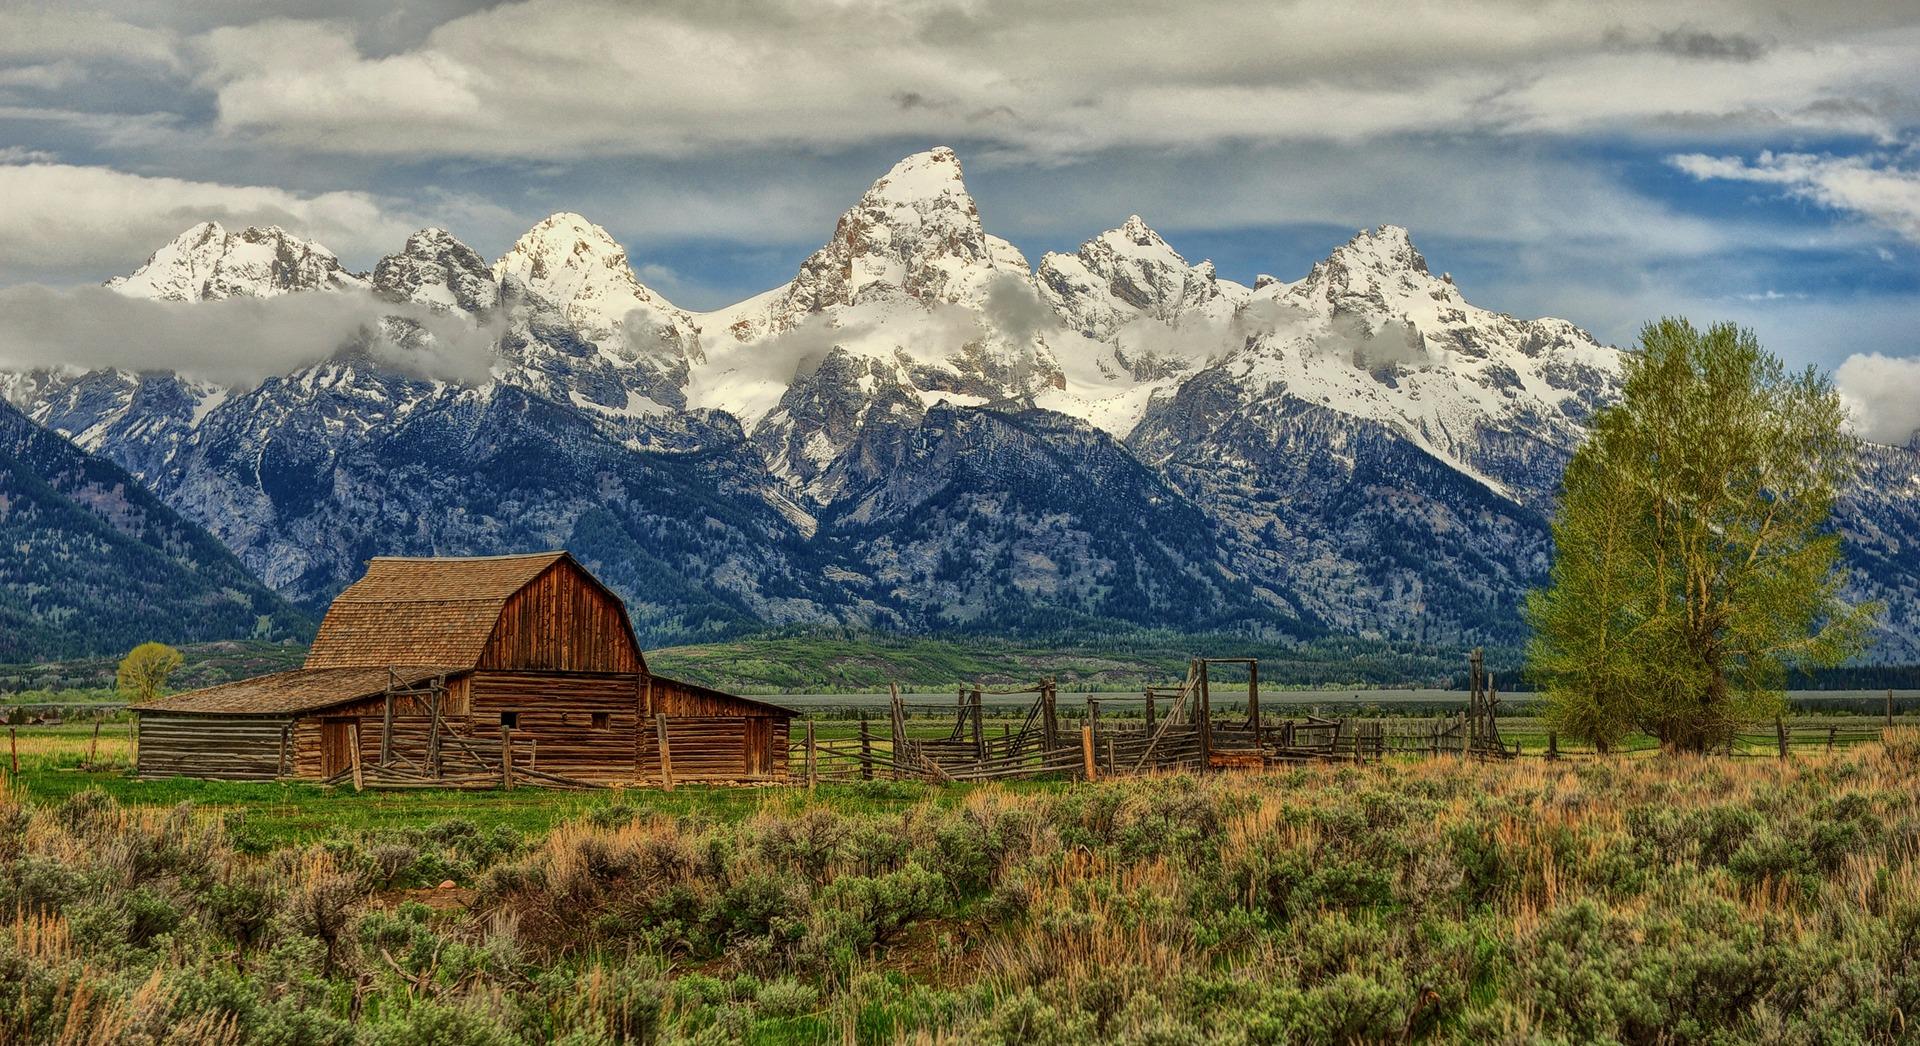 Landscape Photography by Jeff Clow